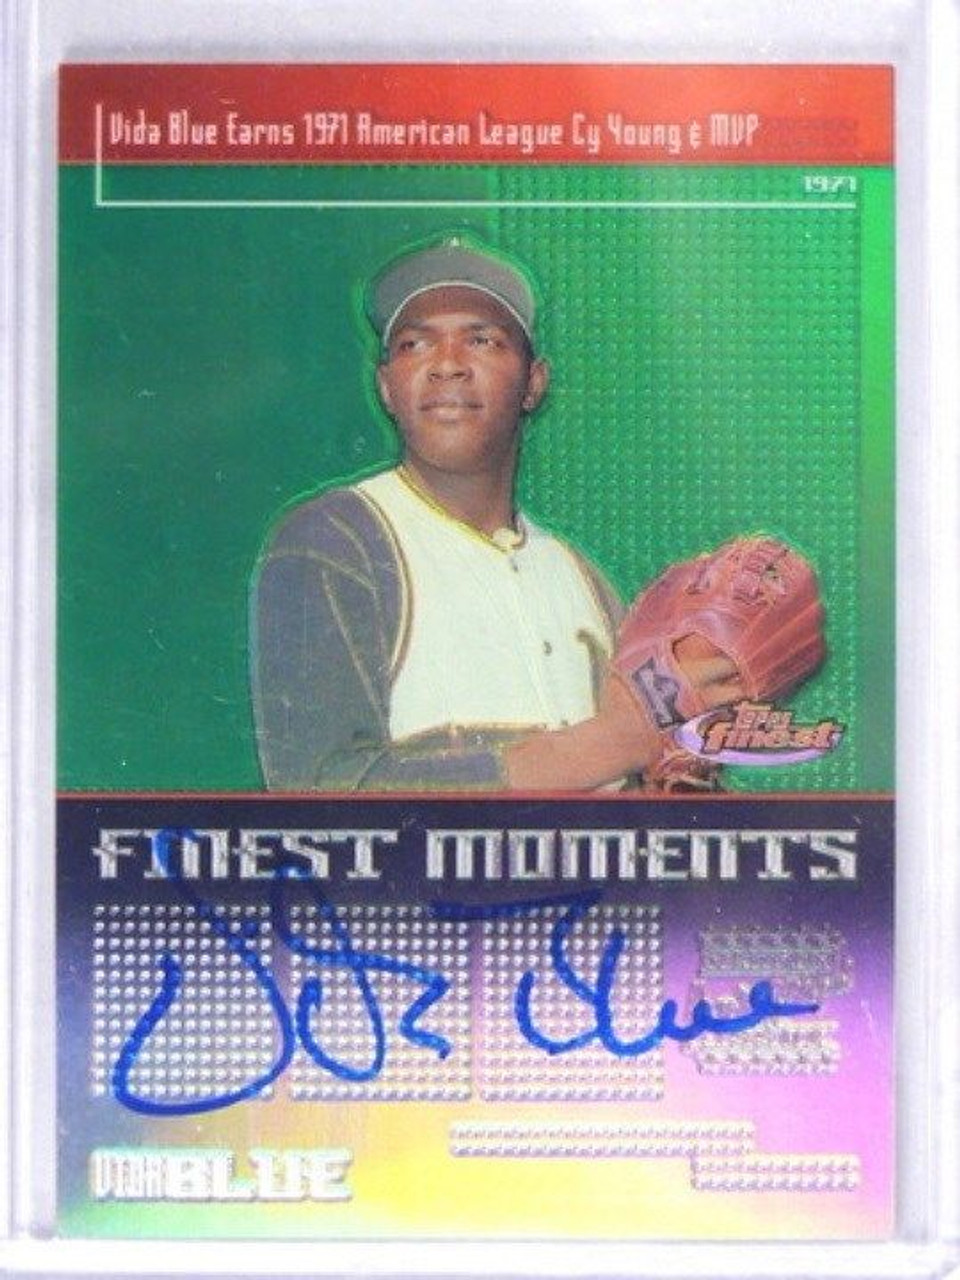 2004 Topps Finest Moments Vida Blue Auto Autograph Fma Vb 35689